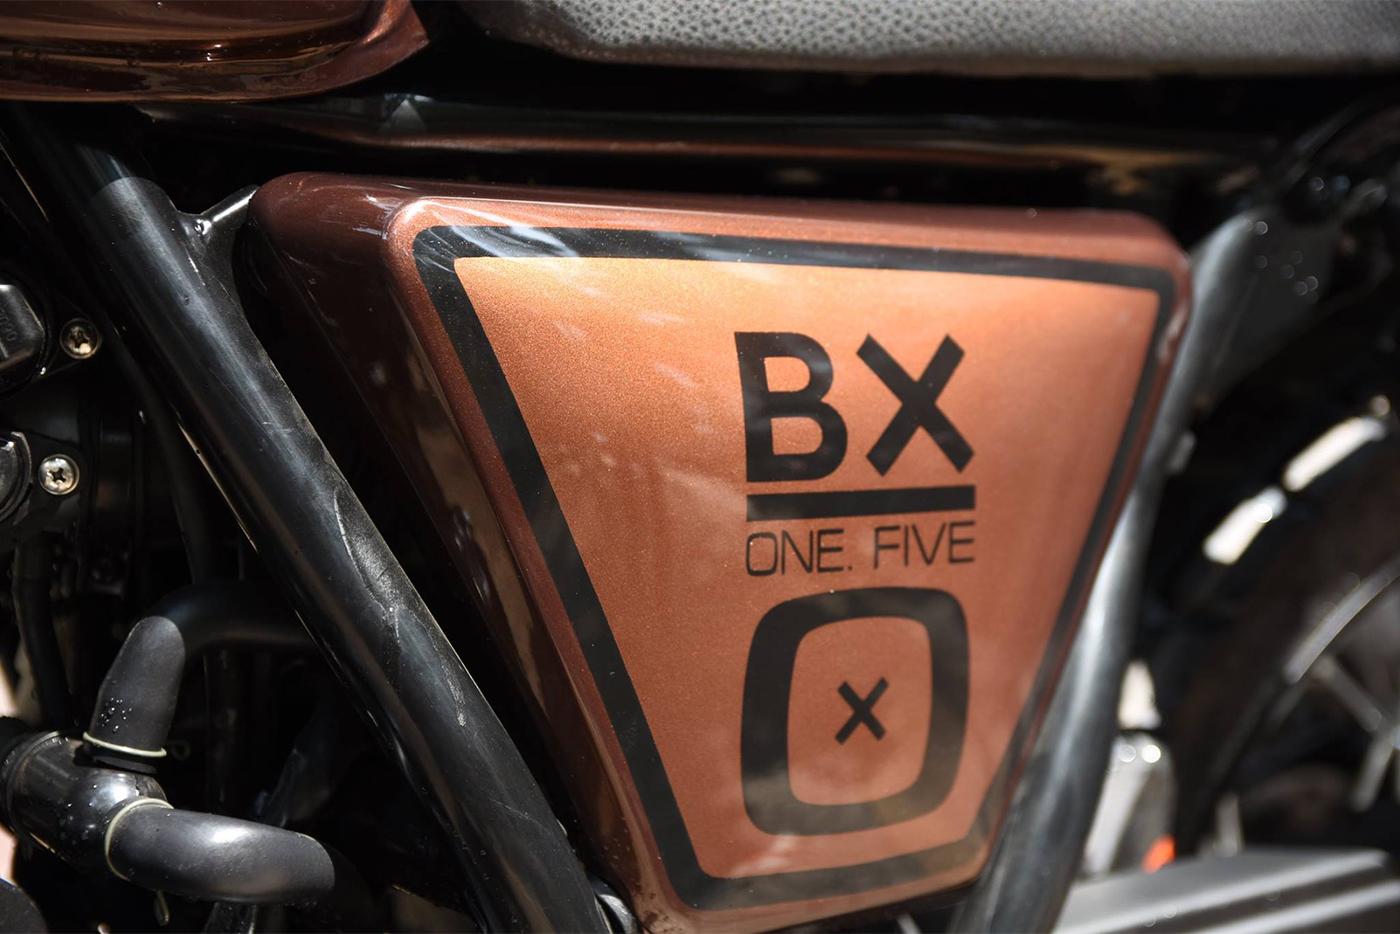 brixton-bx-150-classic-6.jpg